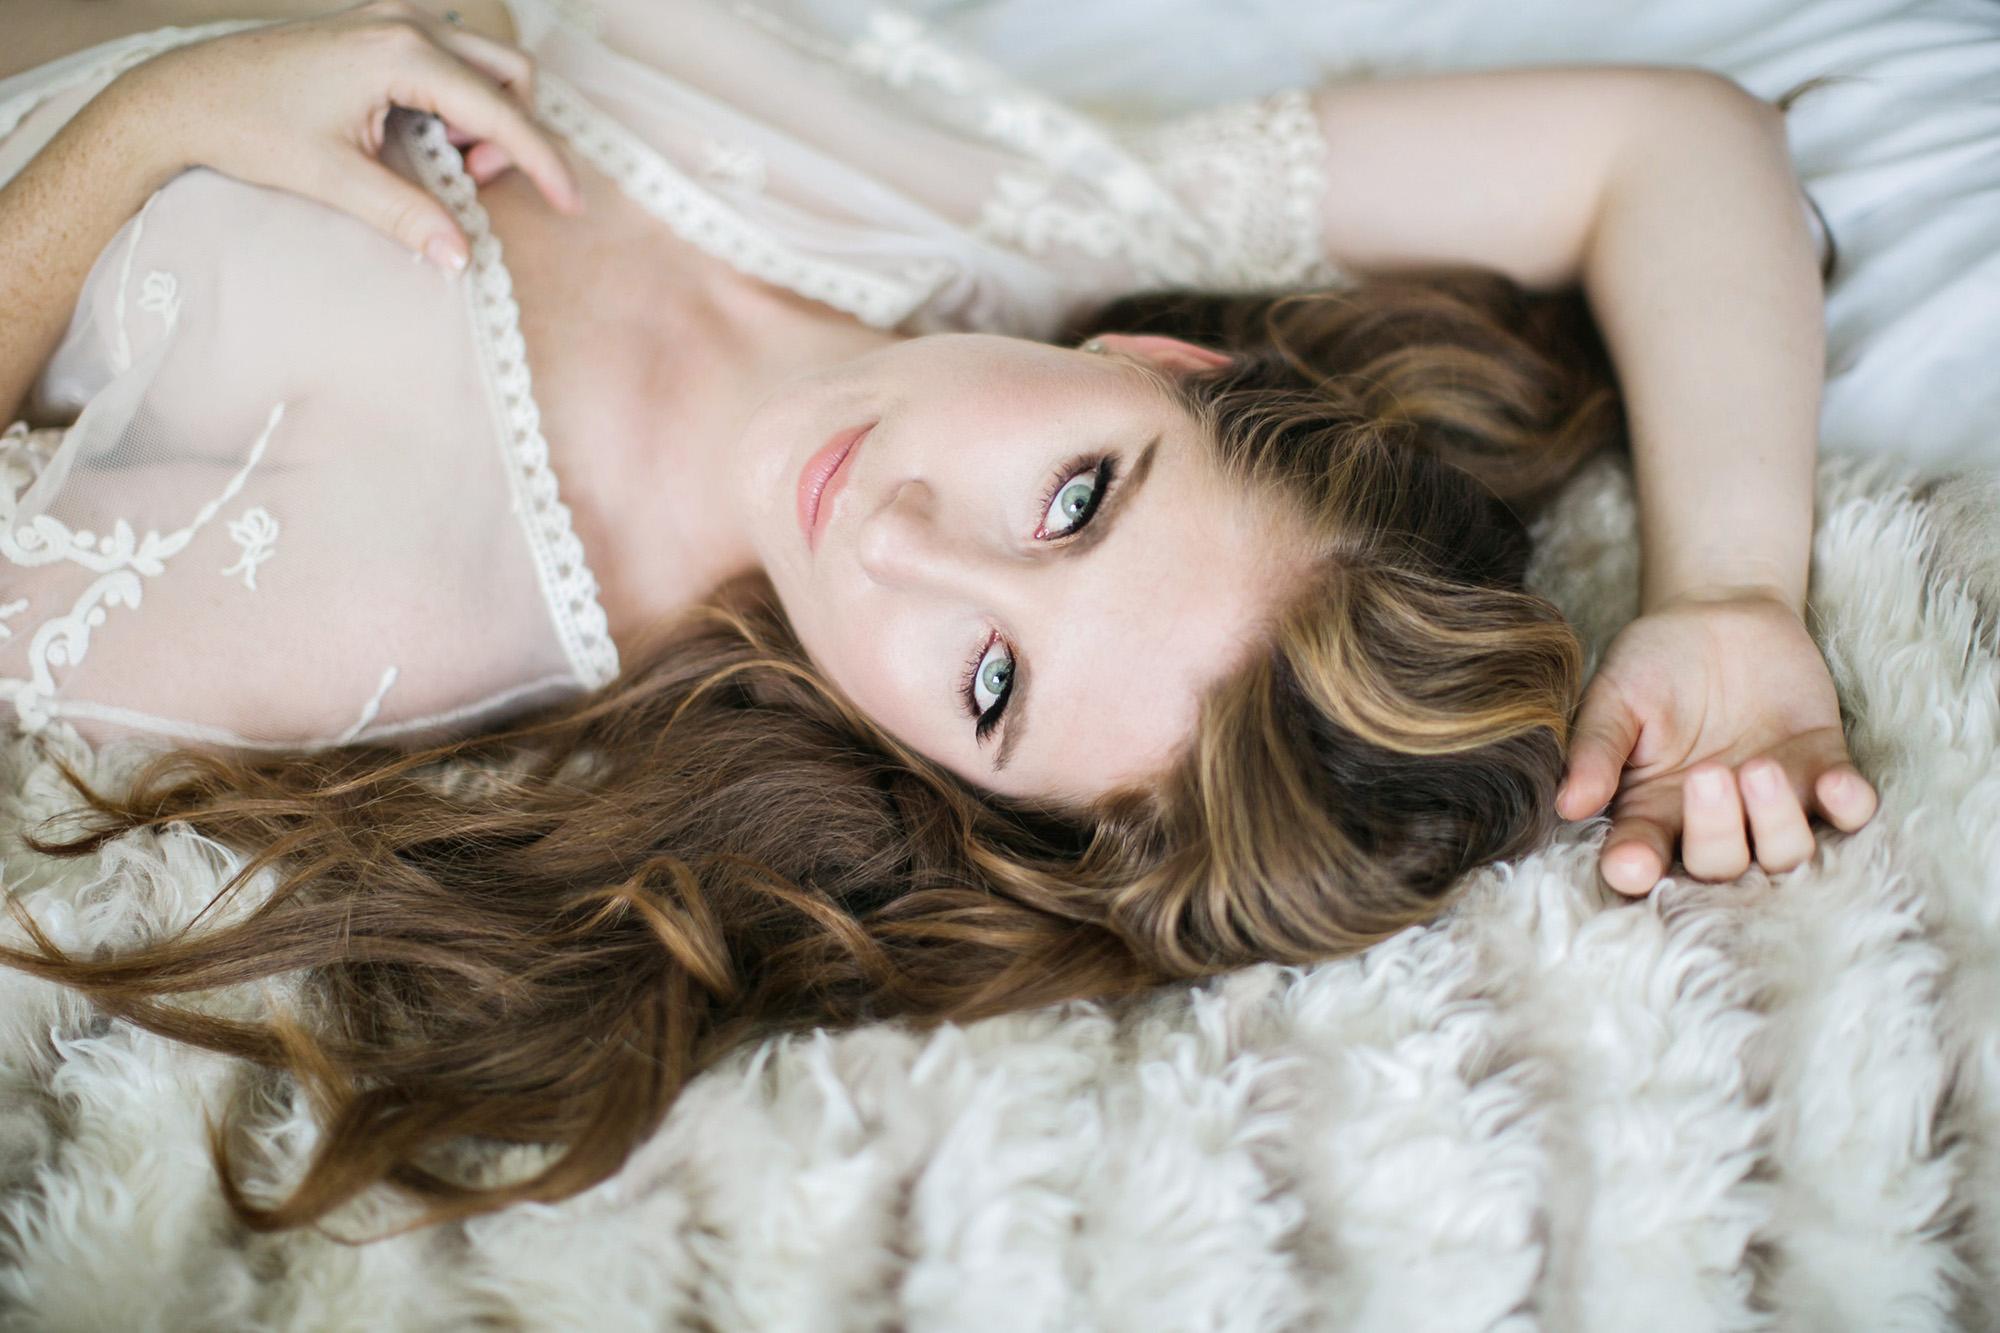 Redlands boudoir photography studio carrie vines photography bridal boudoir